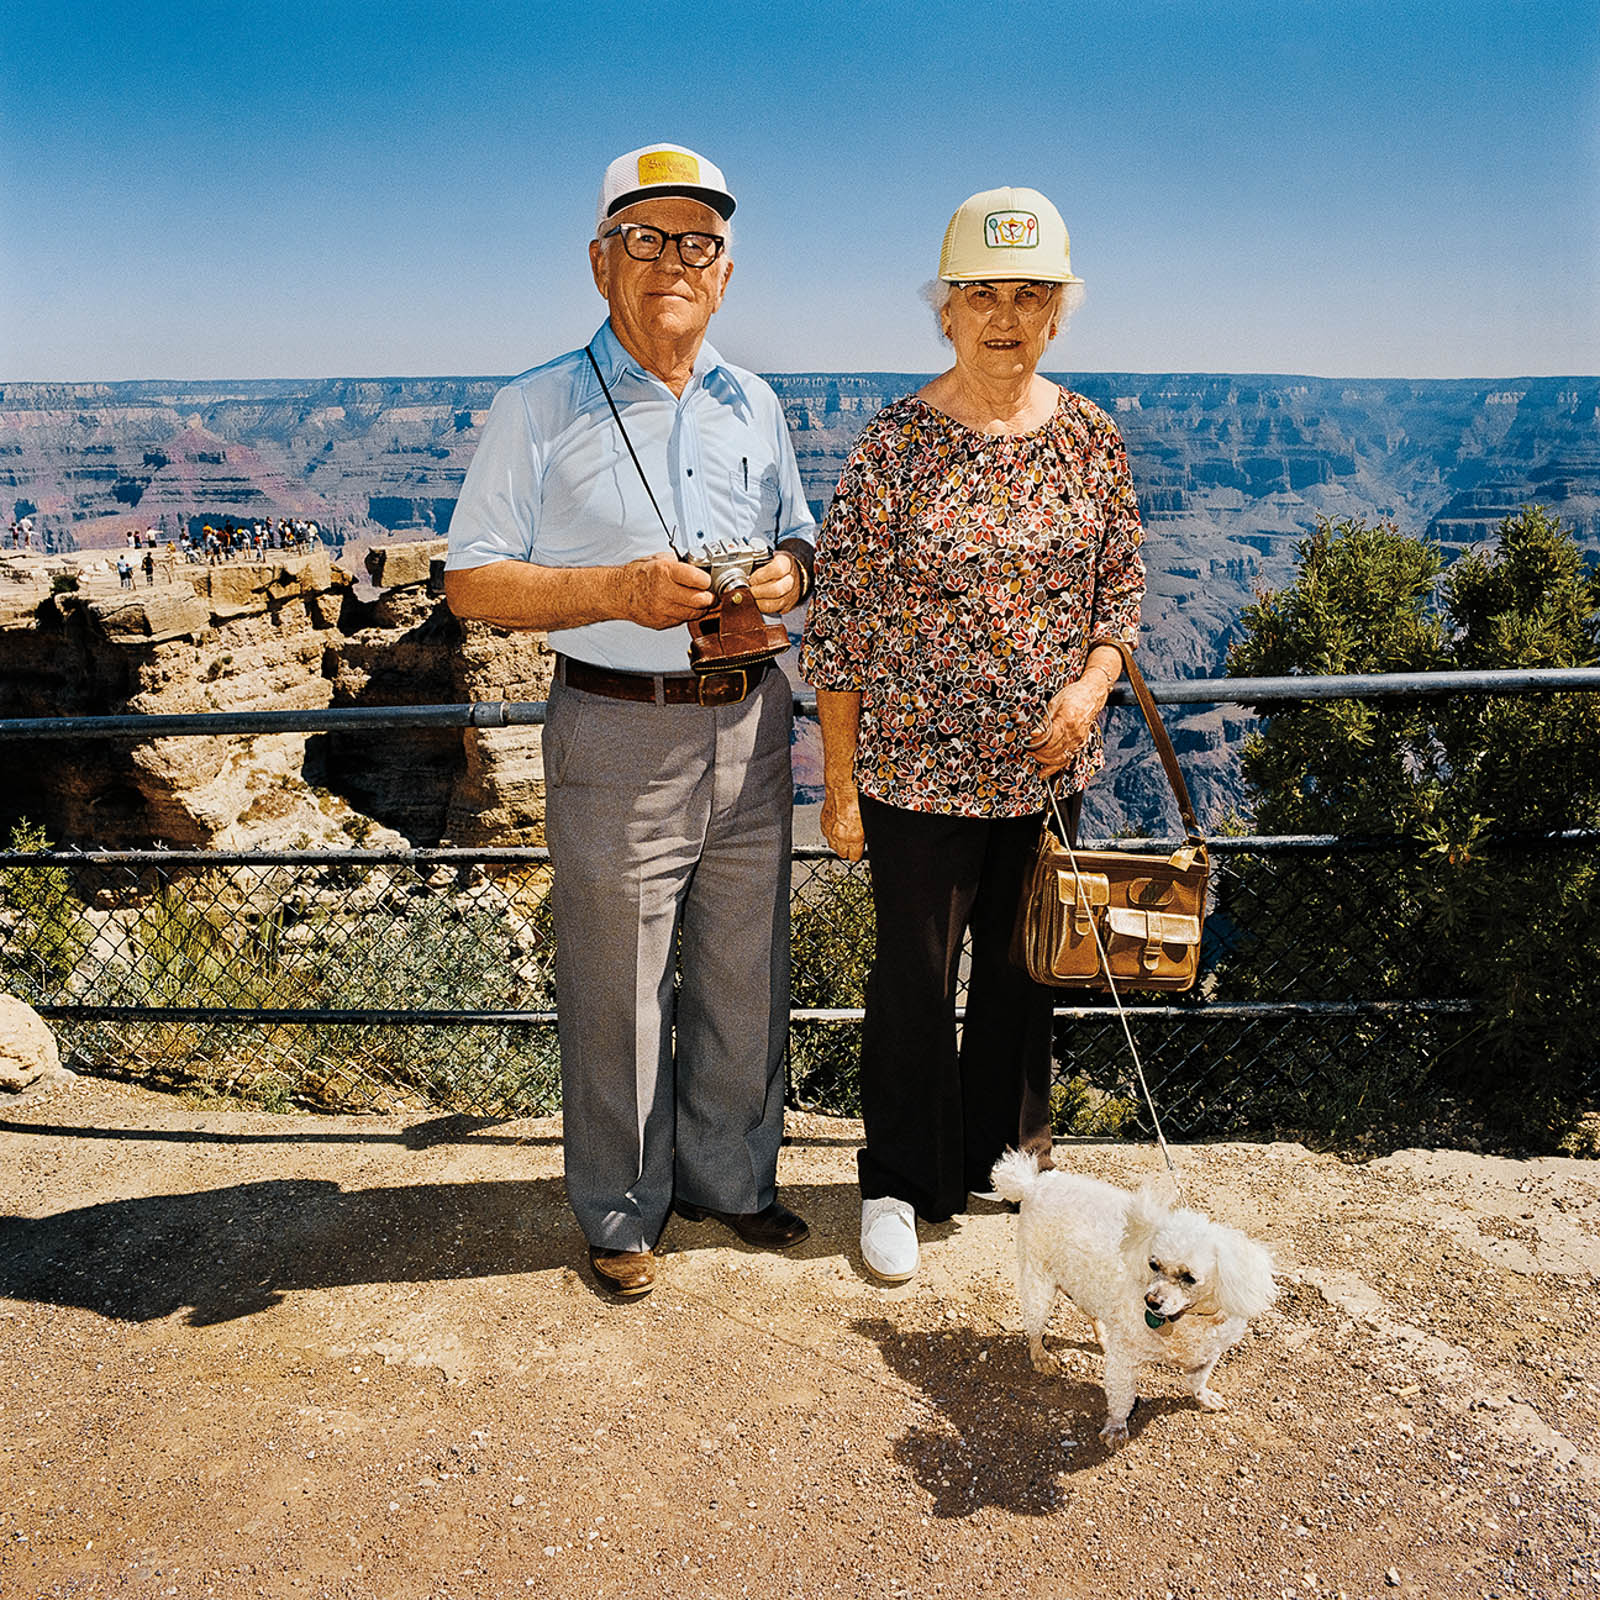 Couple with Poodle, Grand Canyon National Park, Arizona 1980